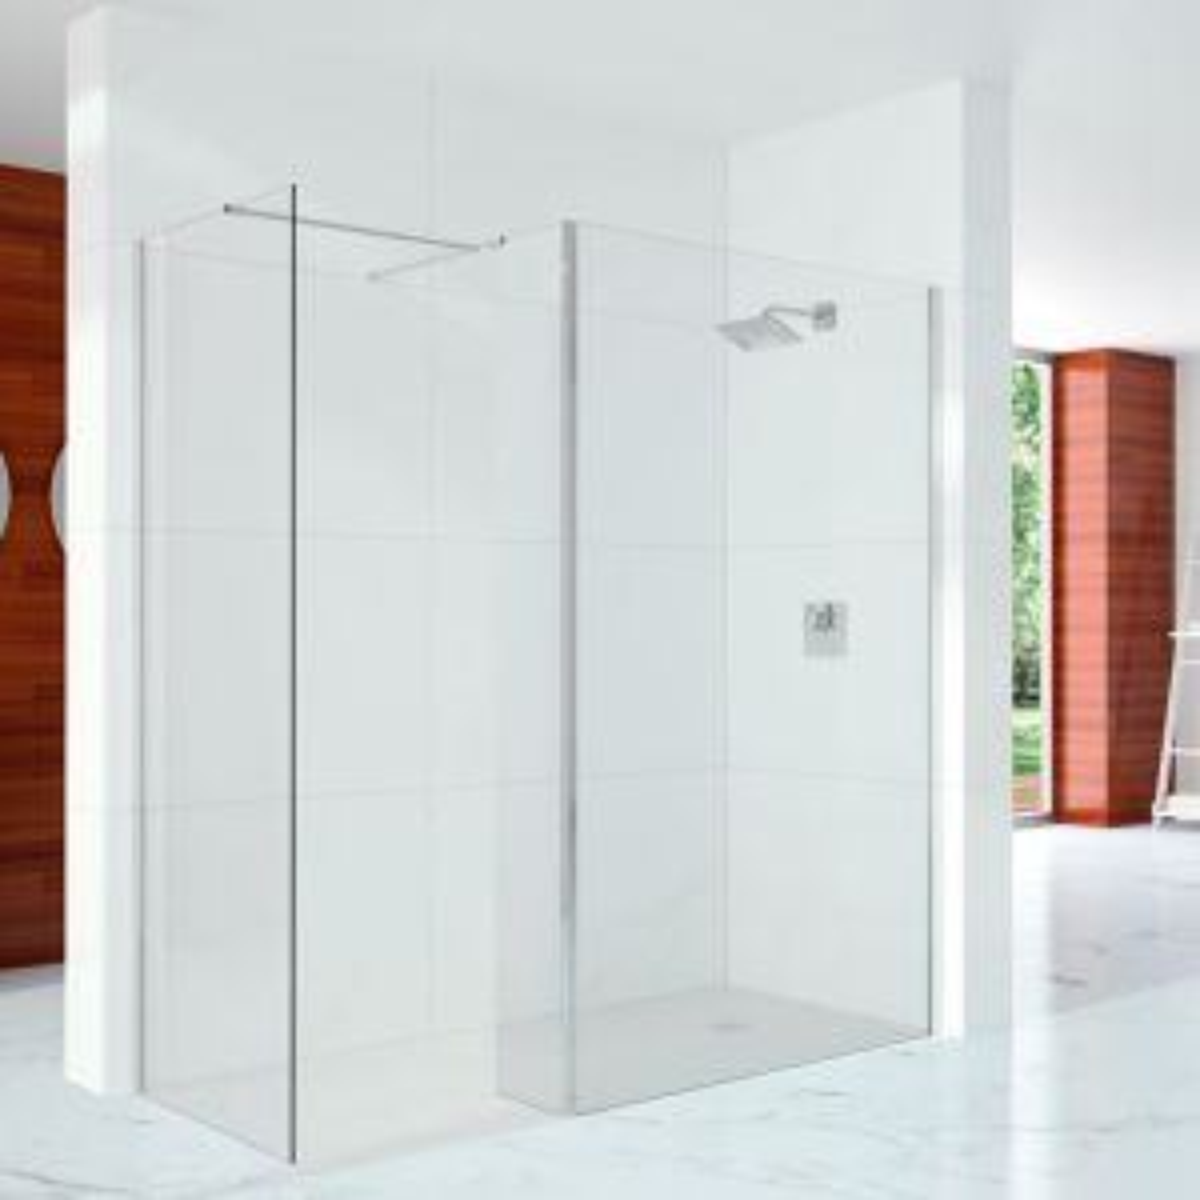 Merlyn Series 10 Showerwall Wetroom with Cube Panel, Side Panel, Stabilising Bar & T Bracket